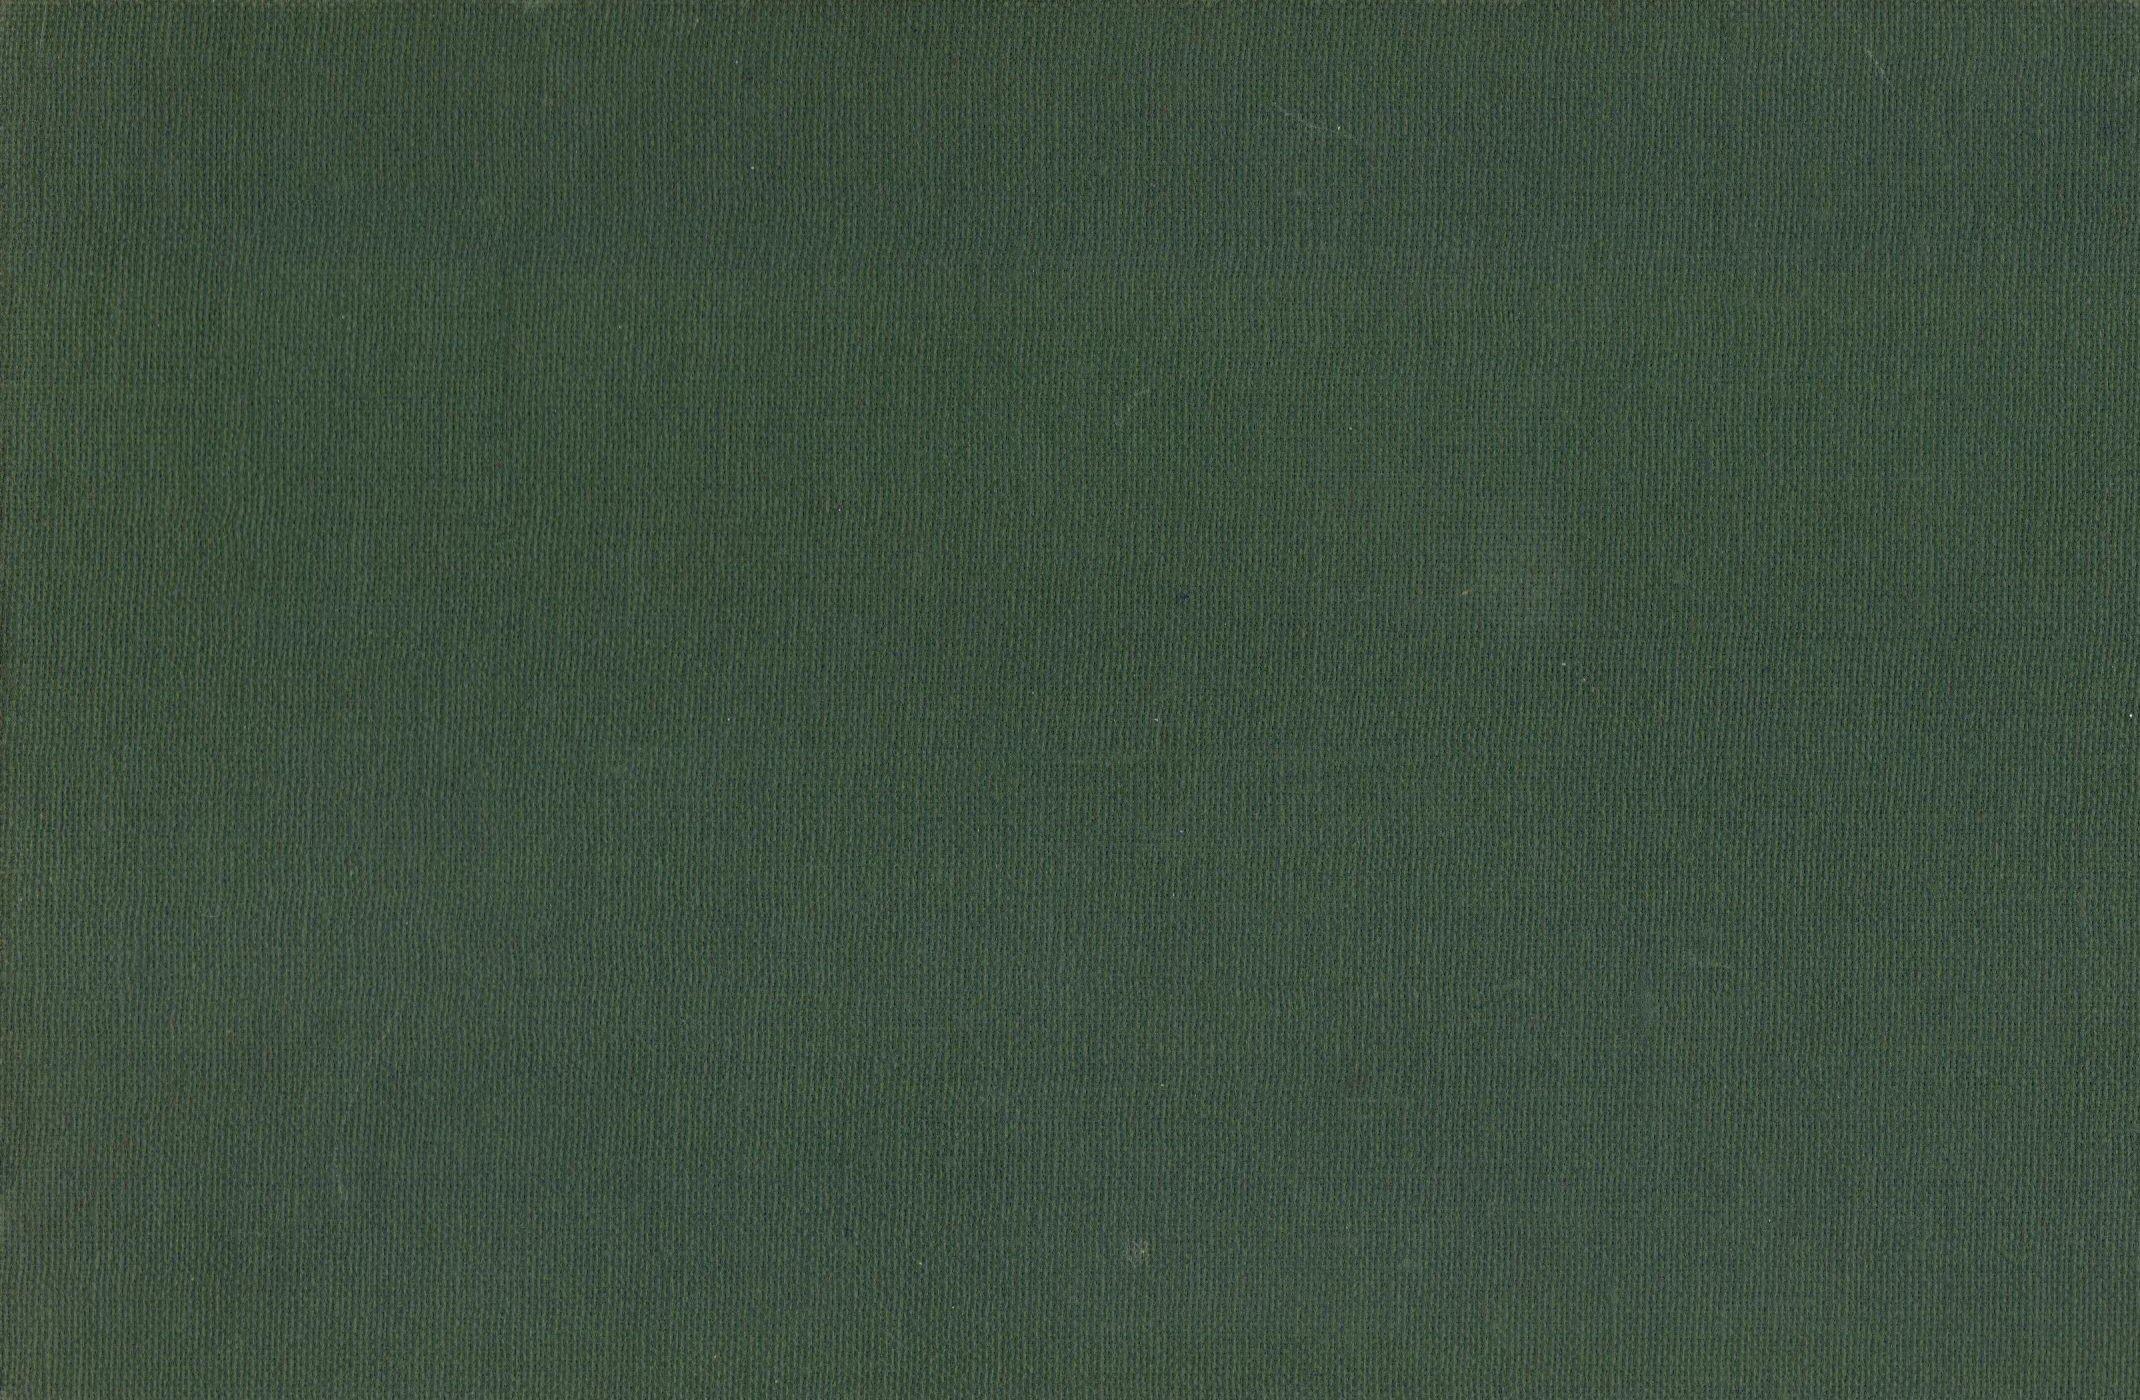 Down Free Plain Fabric Texture Dark Green Background